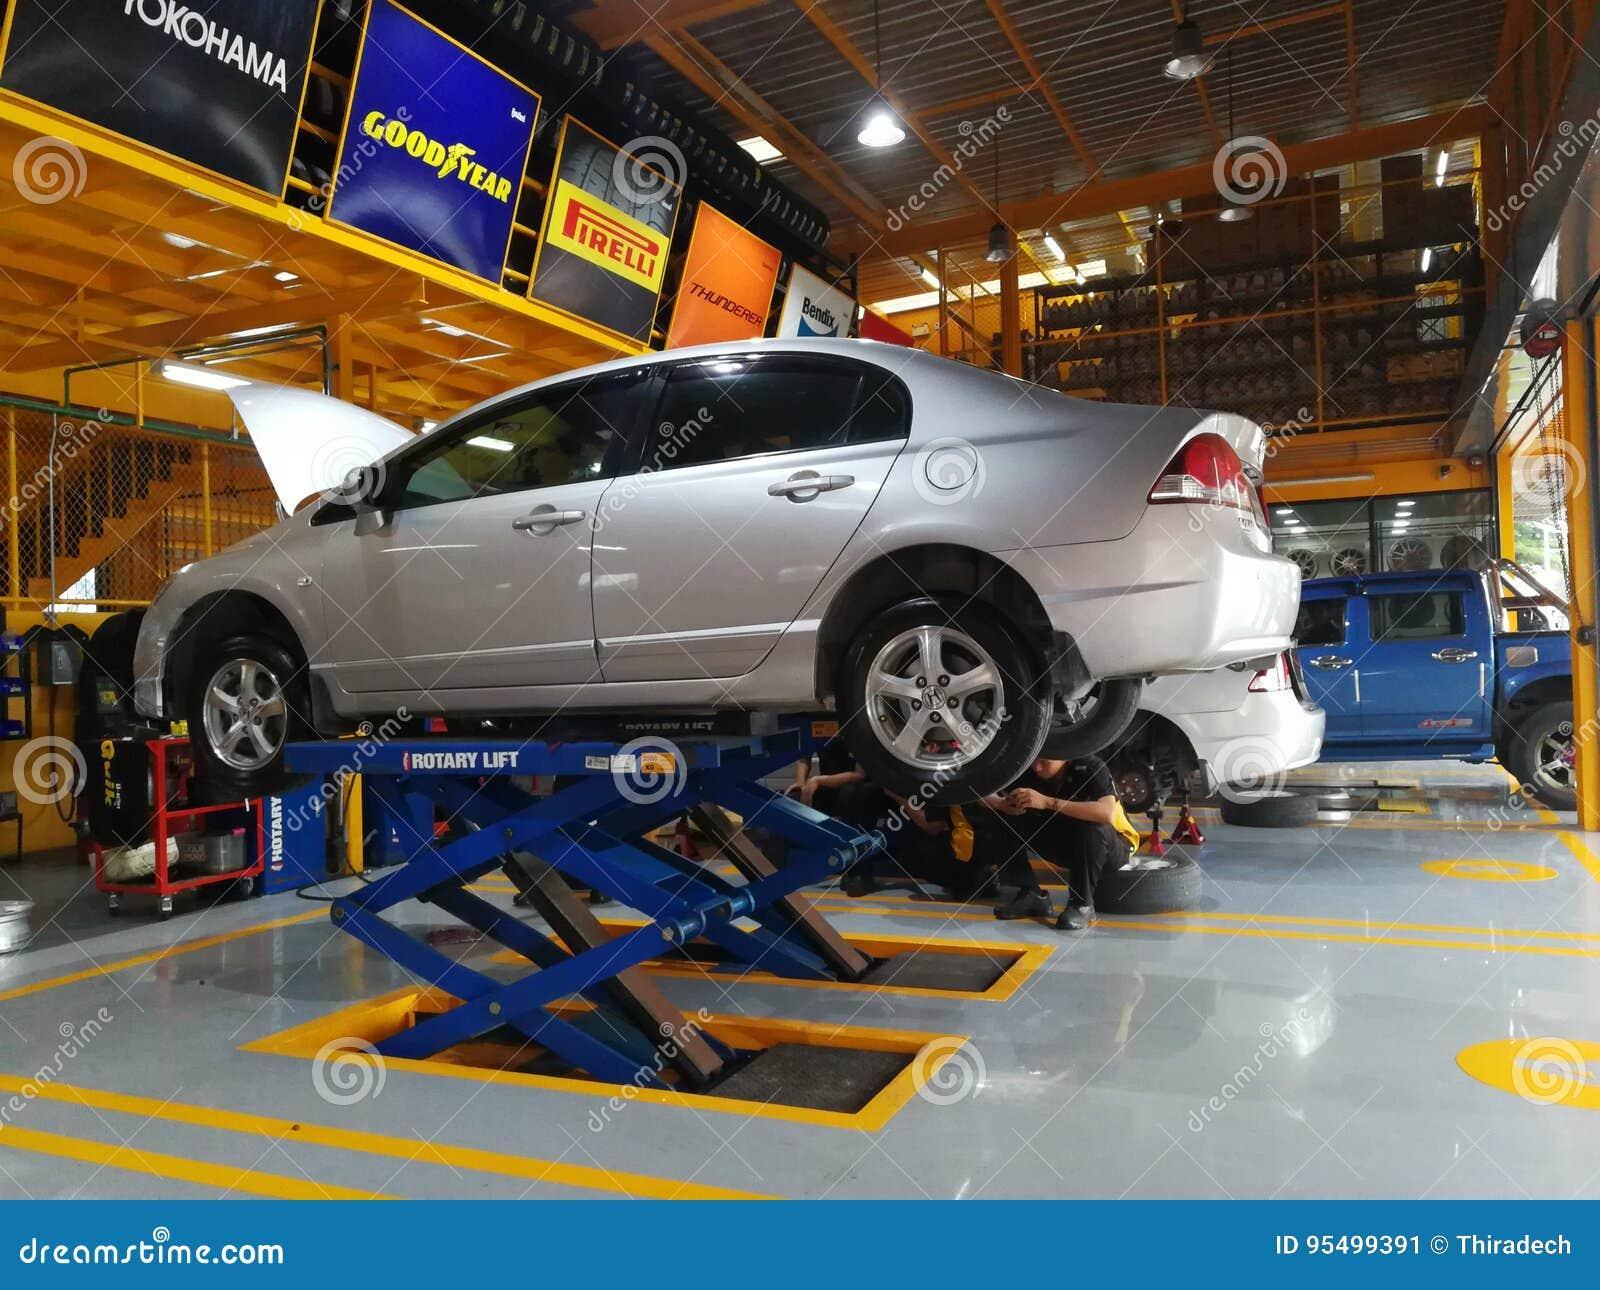 Car Repair And Maintenance >> Car Repair And Maintenance Services Editorial Photo Image